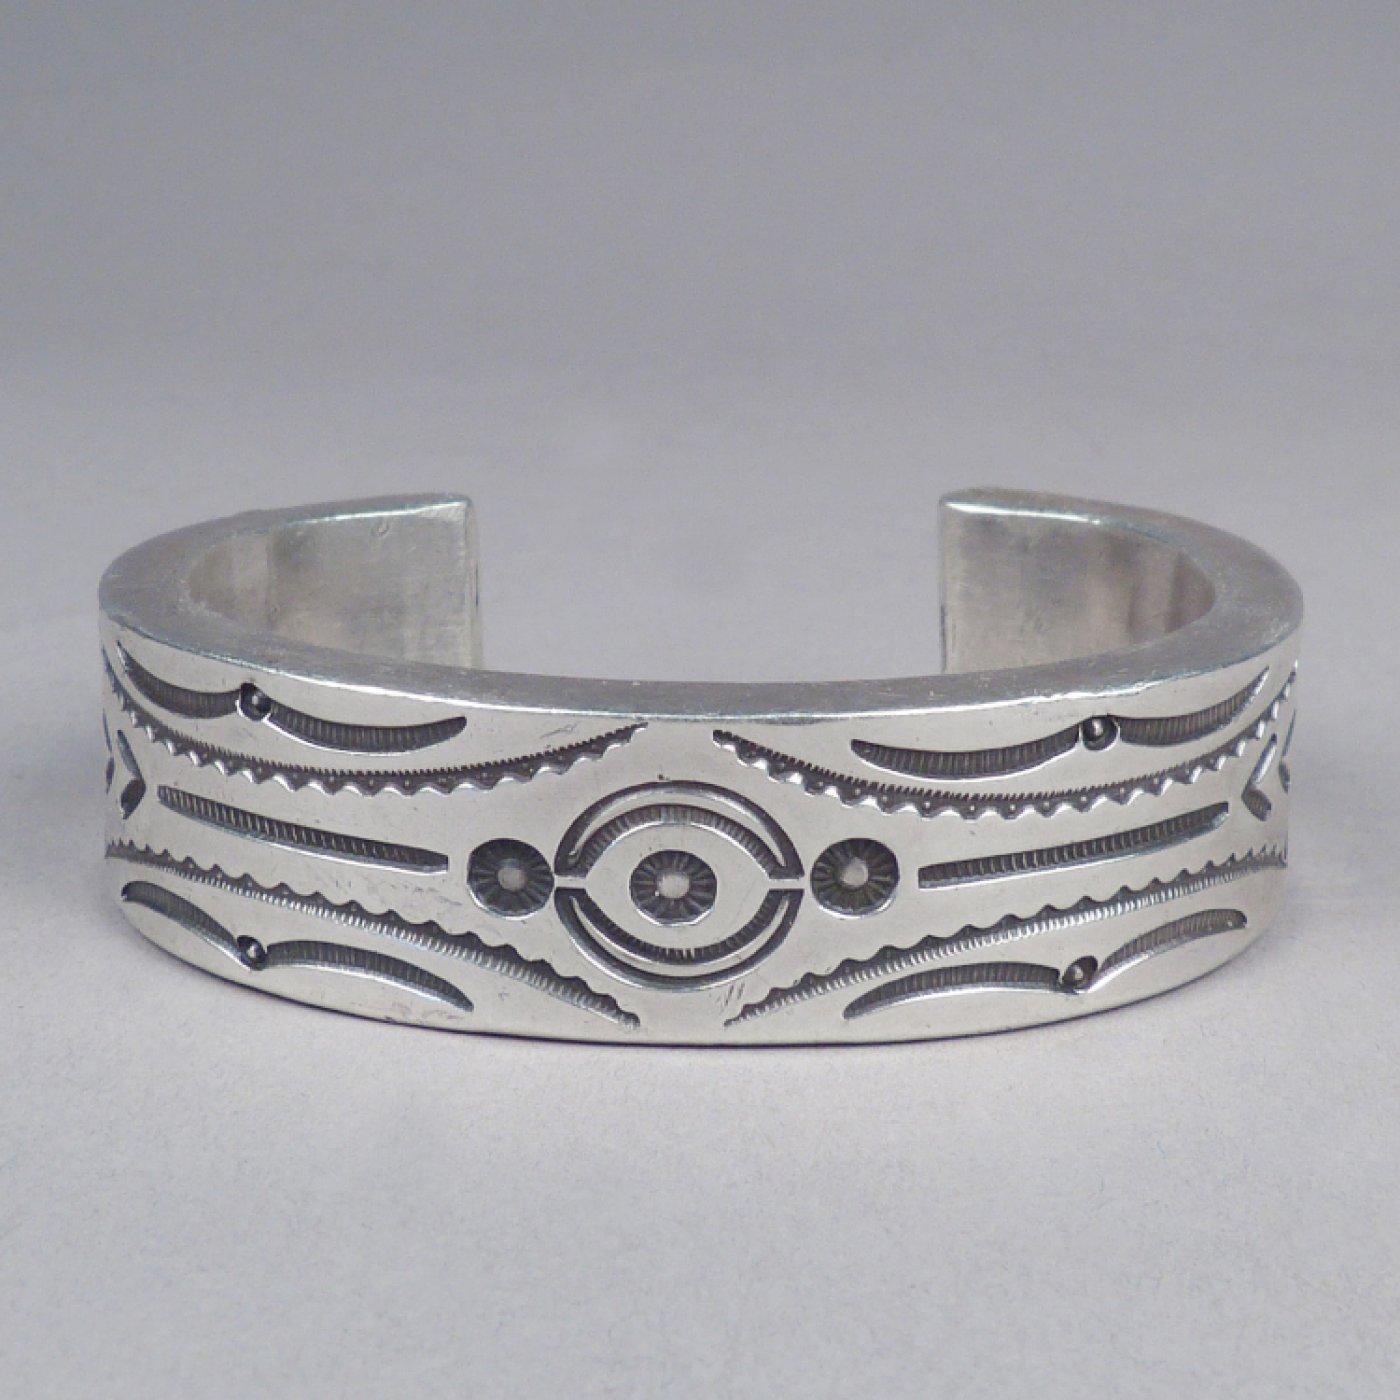 Navajo Heavy Stamped Silver Bracelet By Mark Chee C 1950 Shiprock Santa Fe